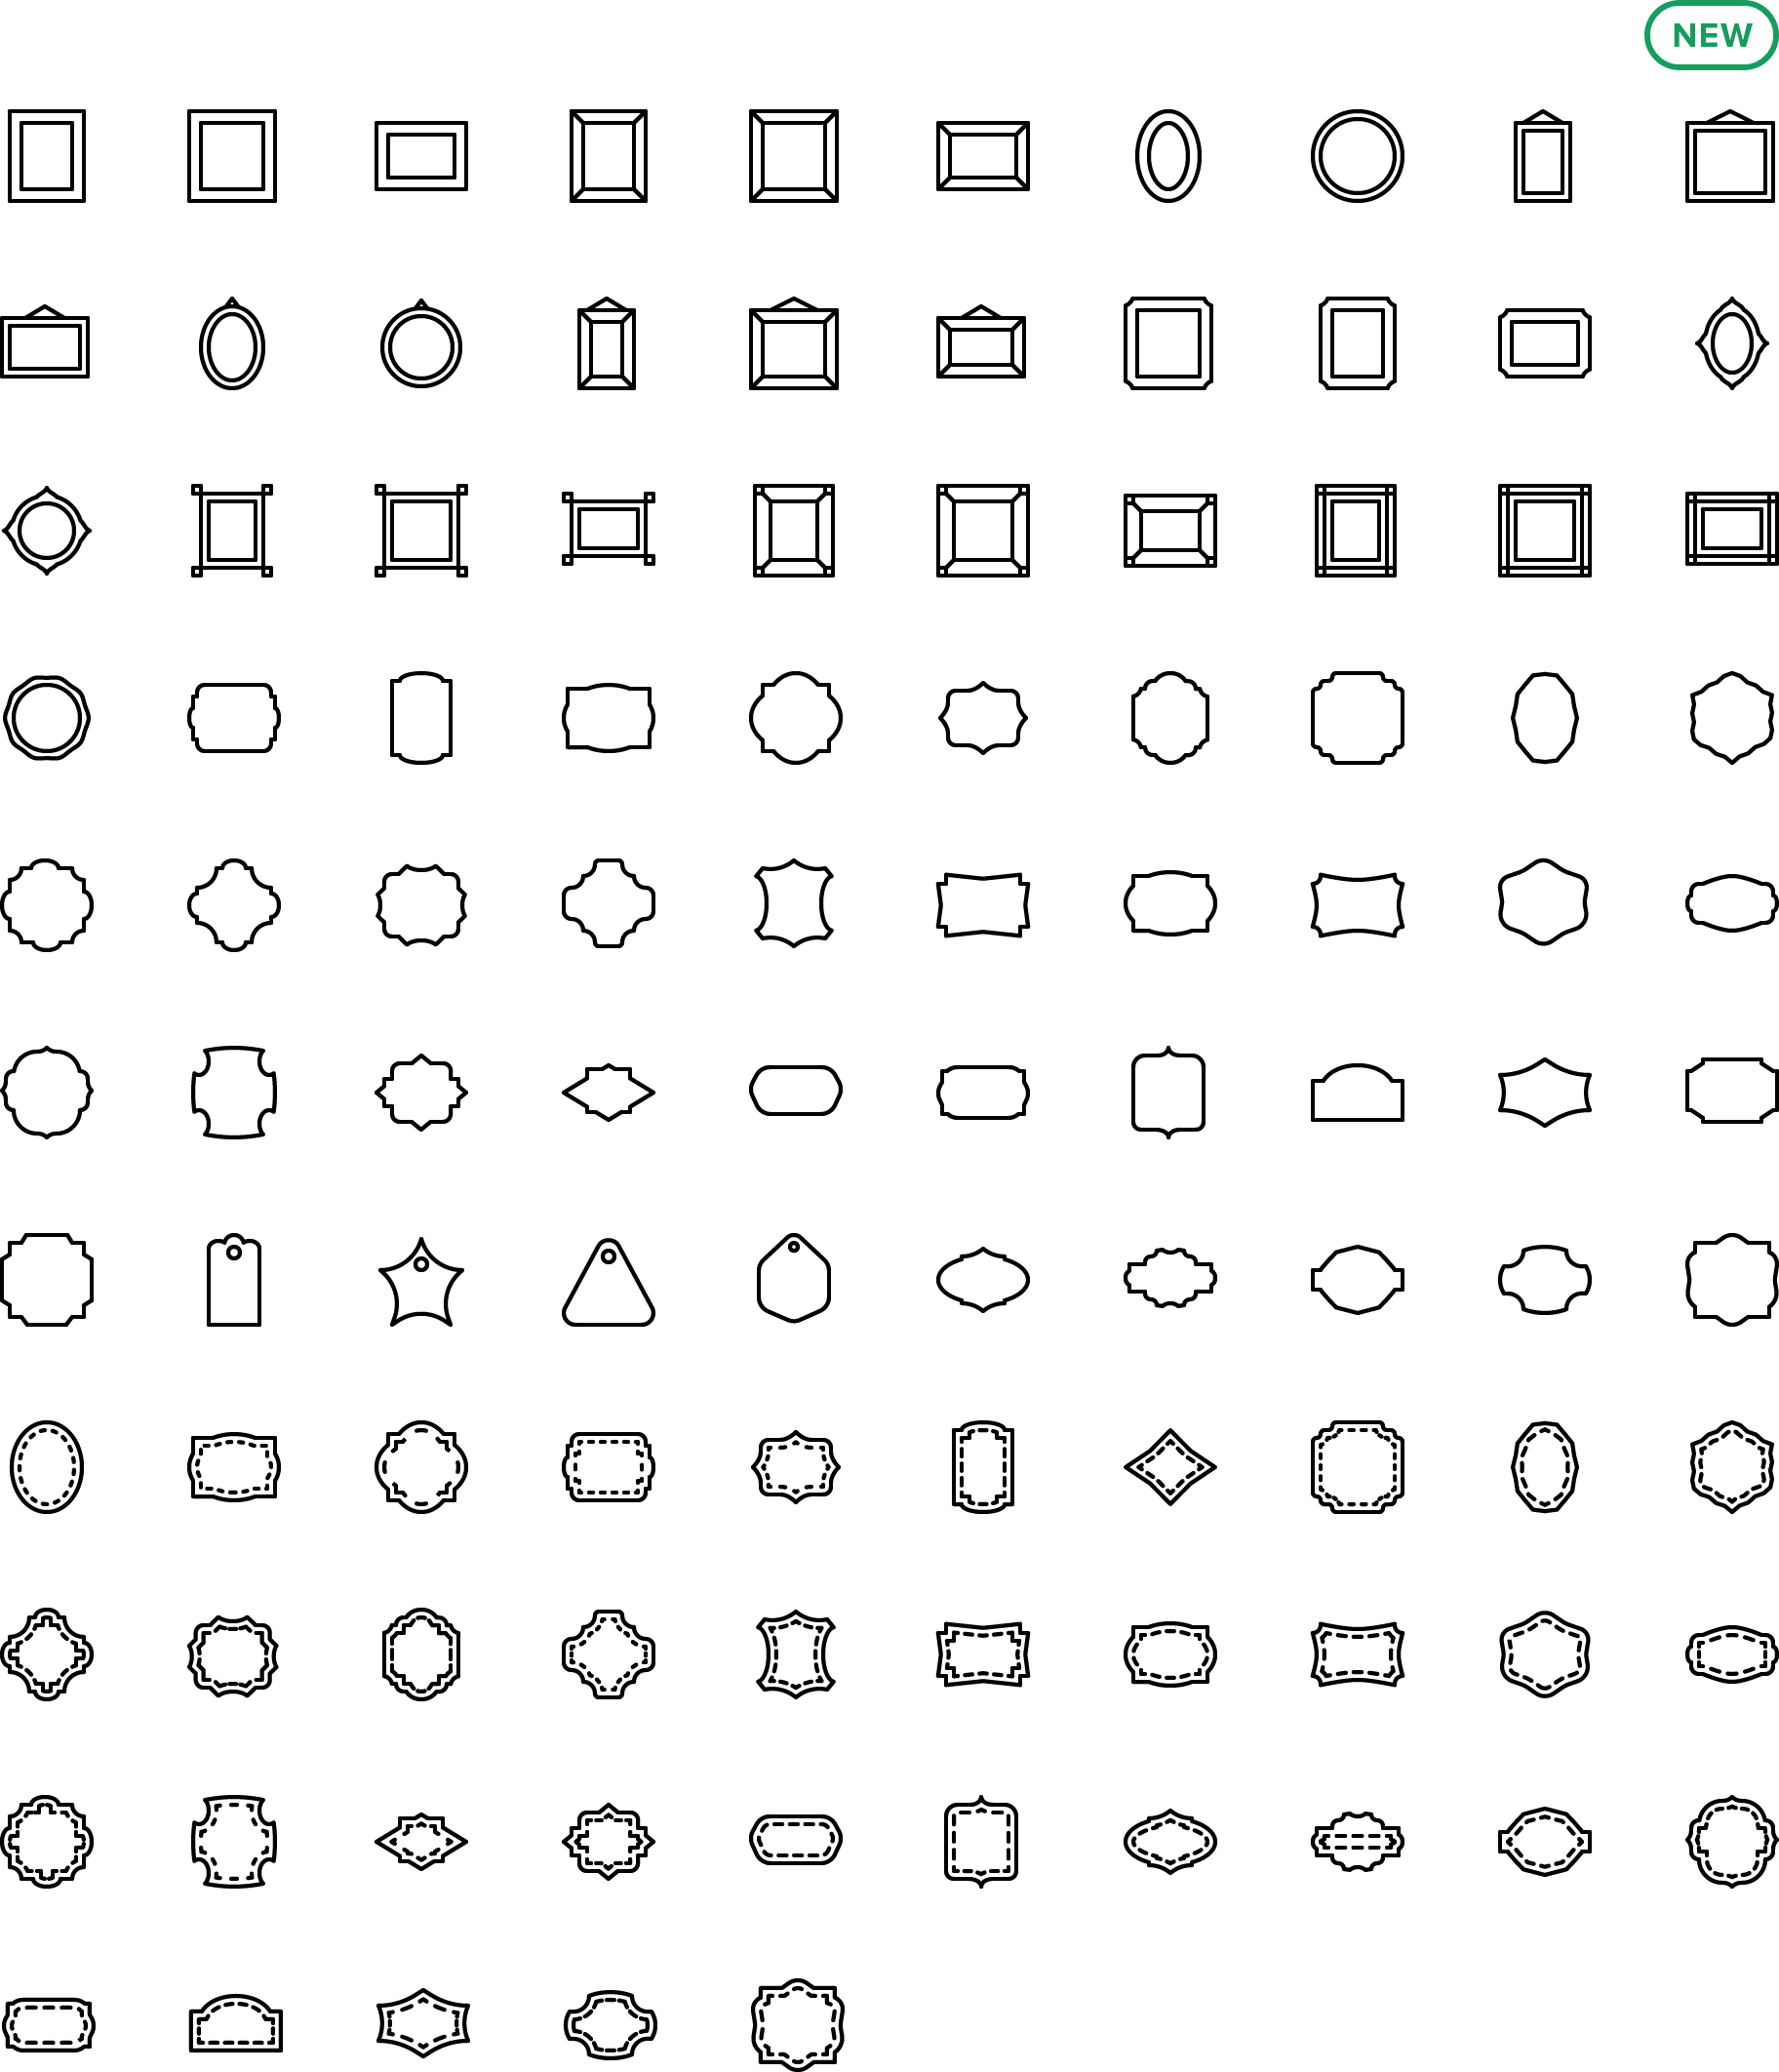 icon Frames